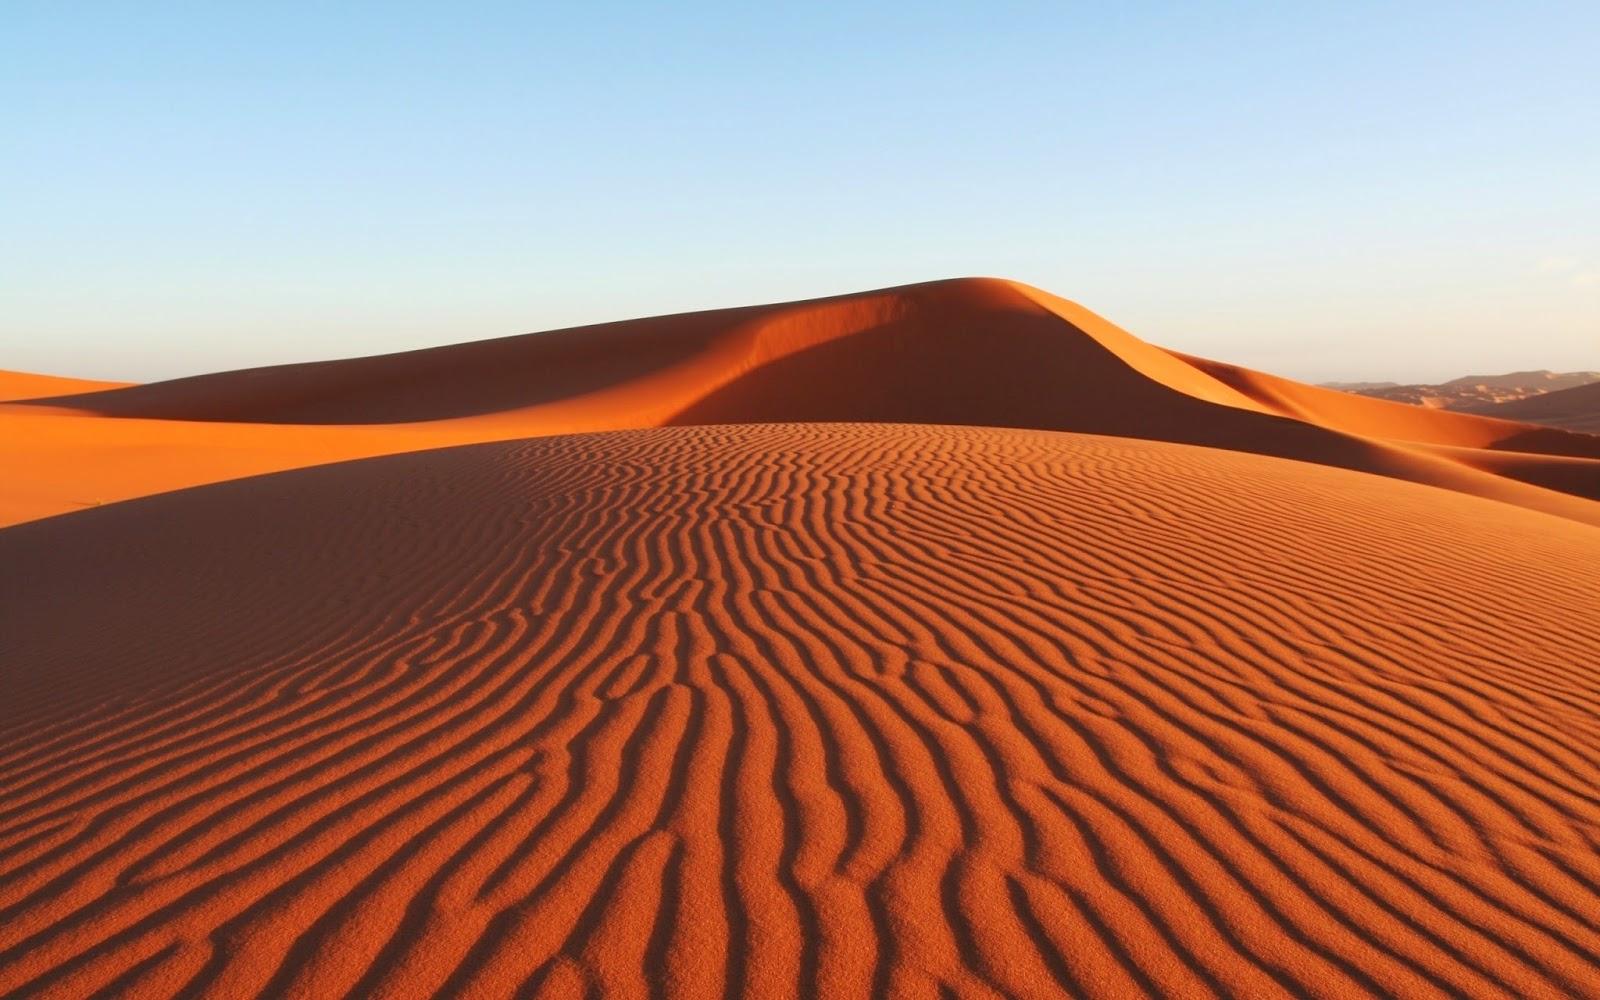 Desert Sand HD Wallpaper